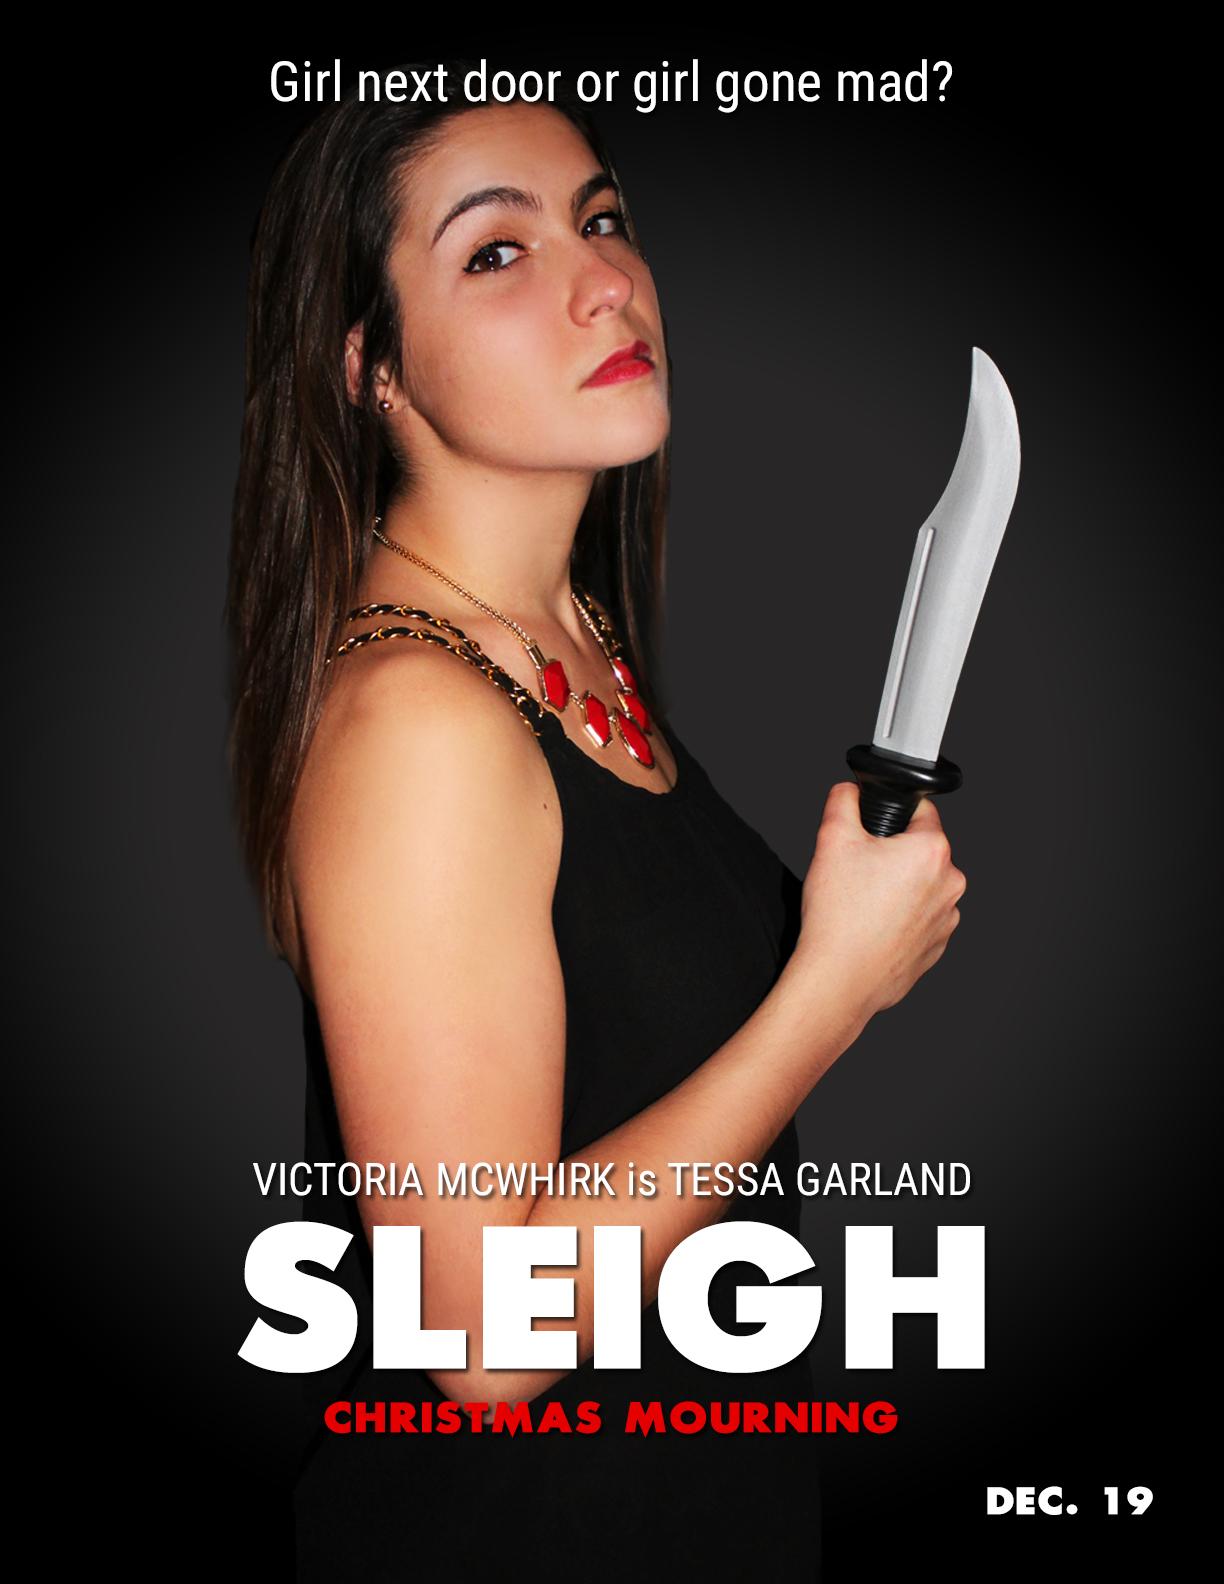 Vicki-Poster.jpg